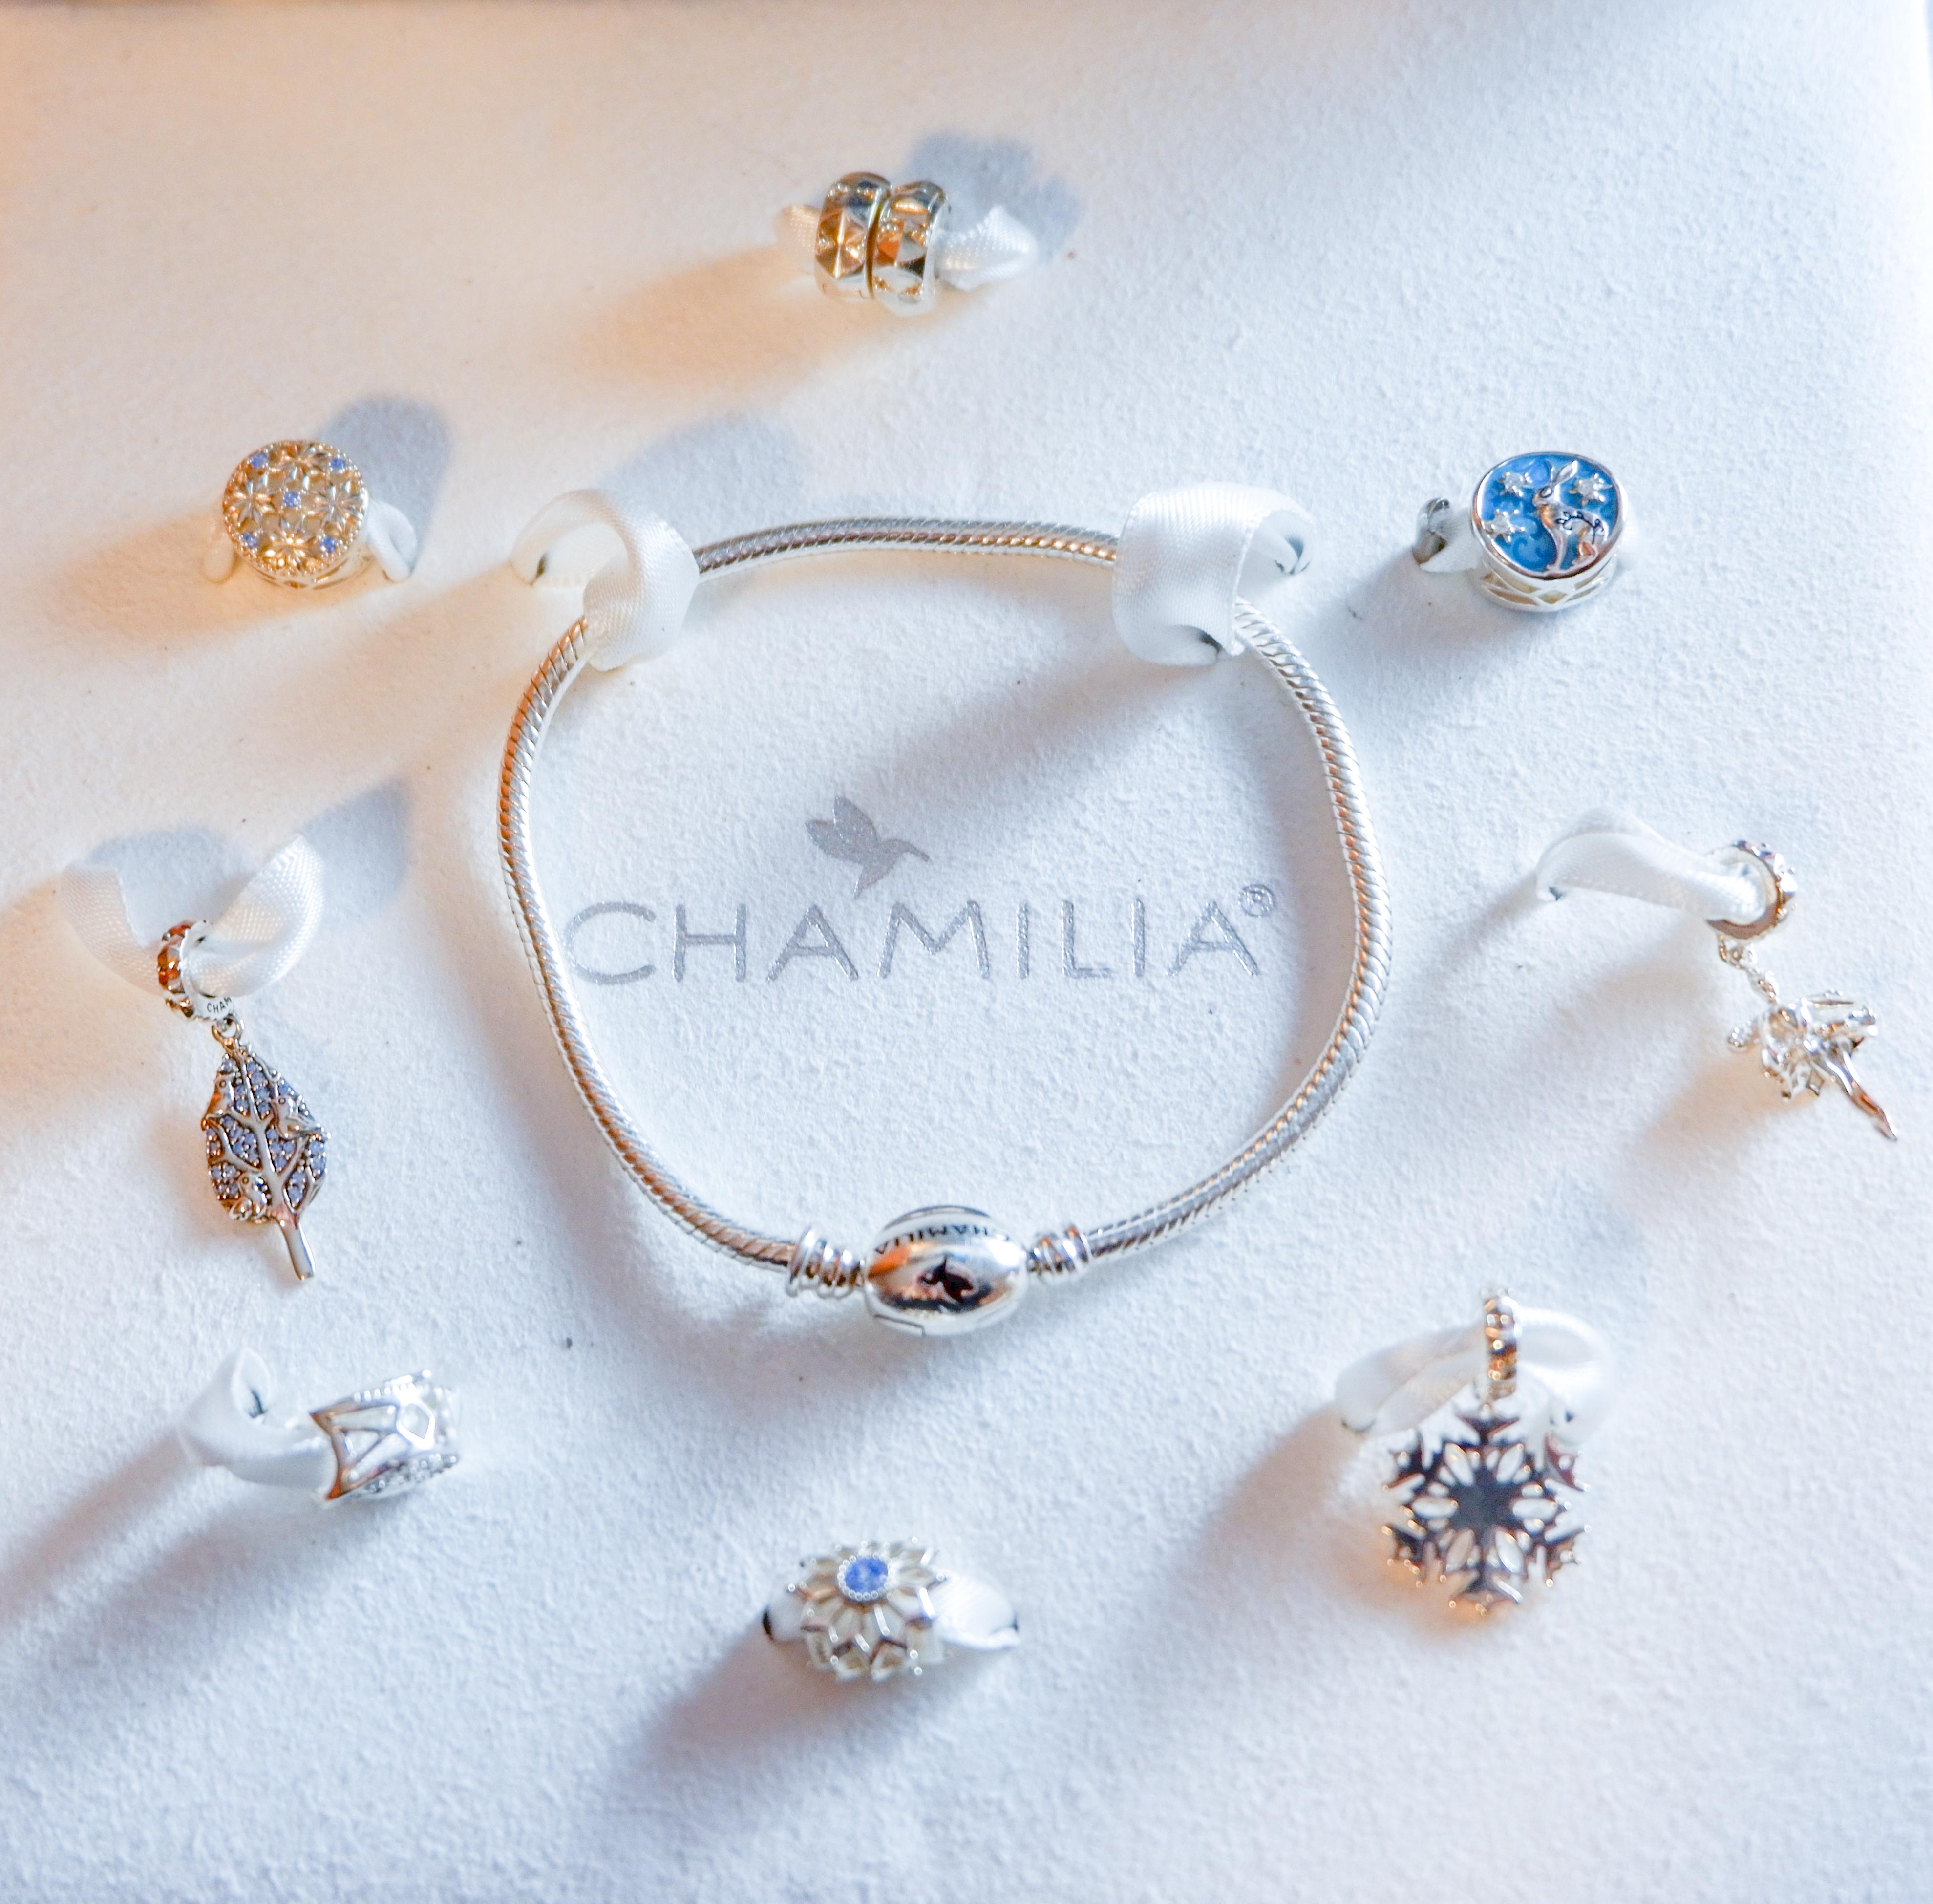 Chamilia Enchanted Forest Gift Set